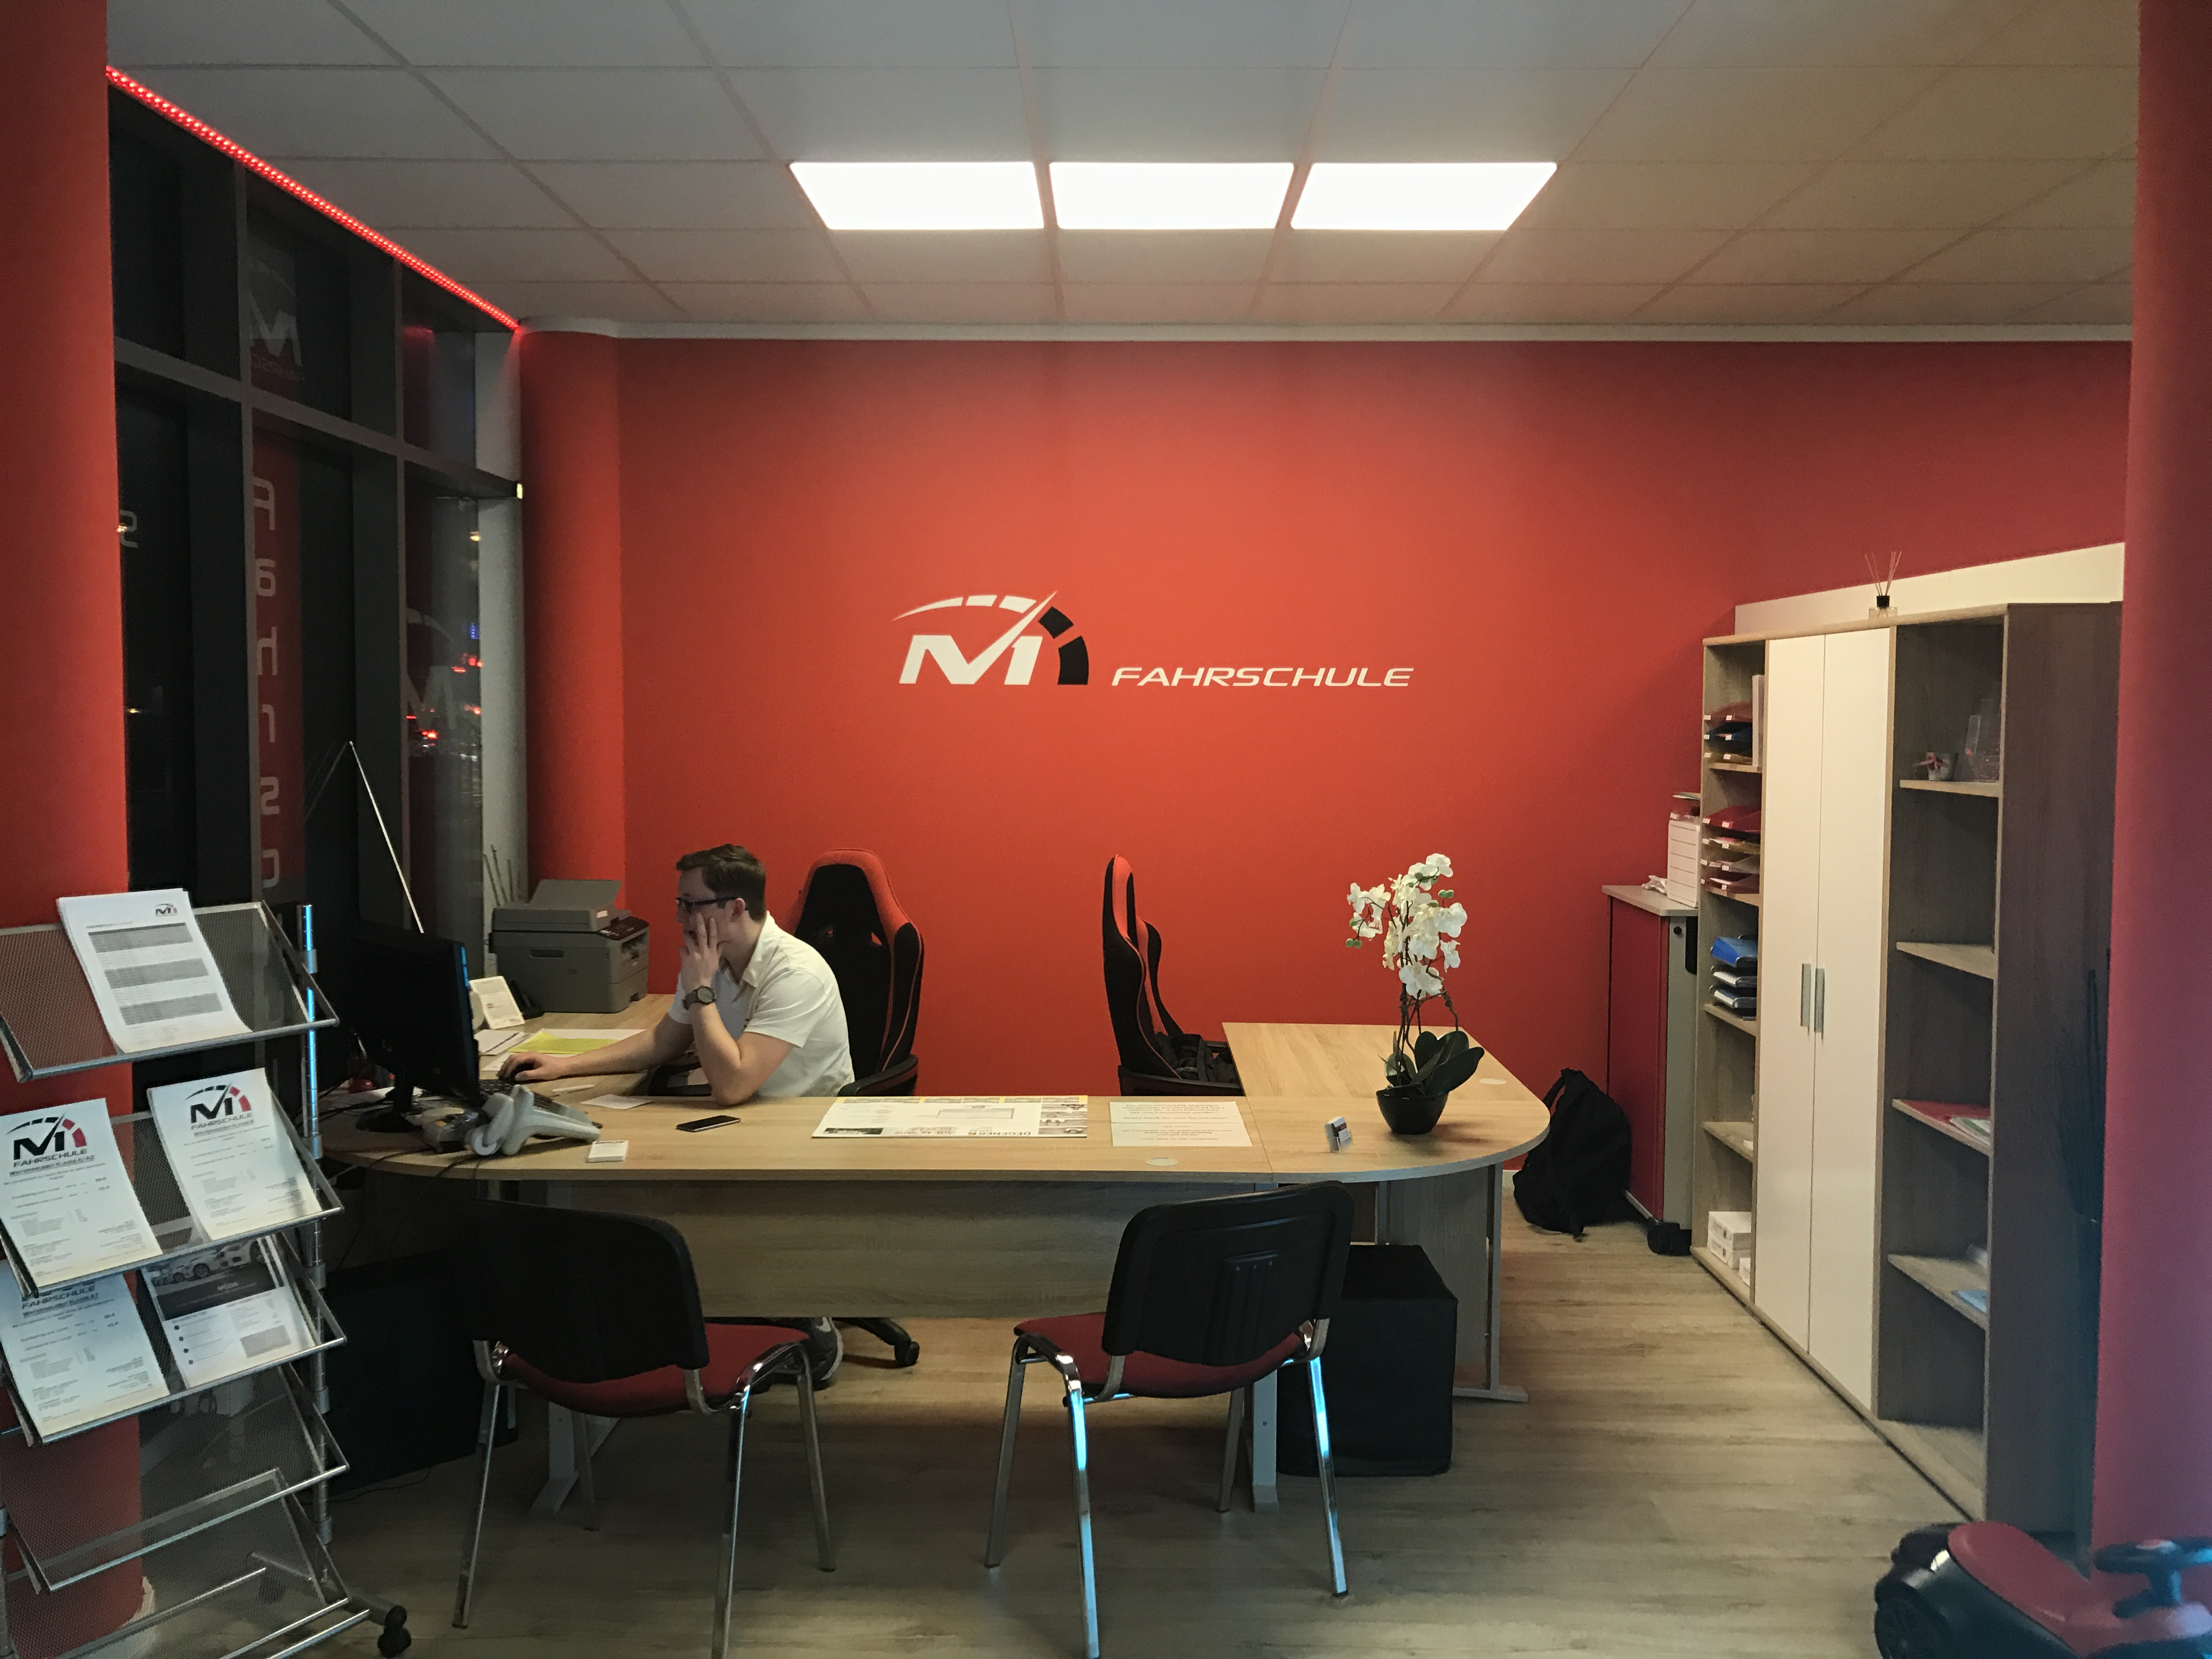 unsere filialen in m nchen empfang fahrschule m1. Black Bedroom Furniture Sets. Home Design Ideas